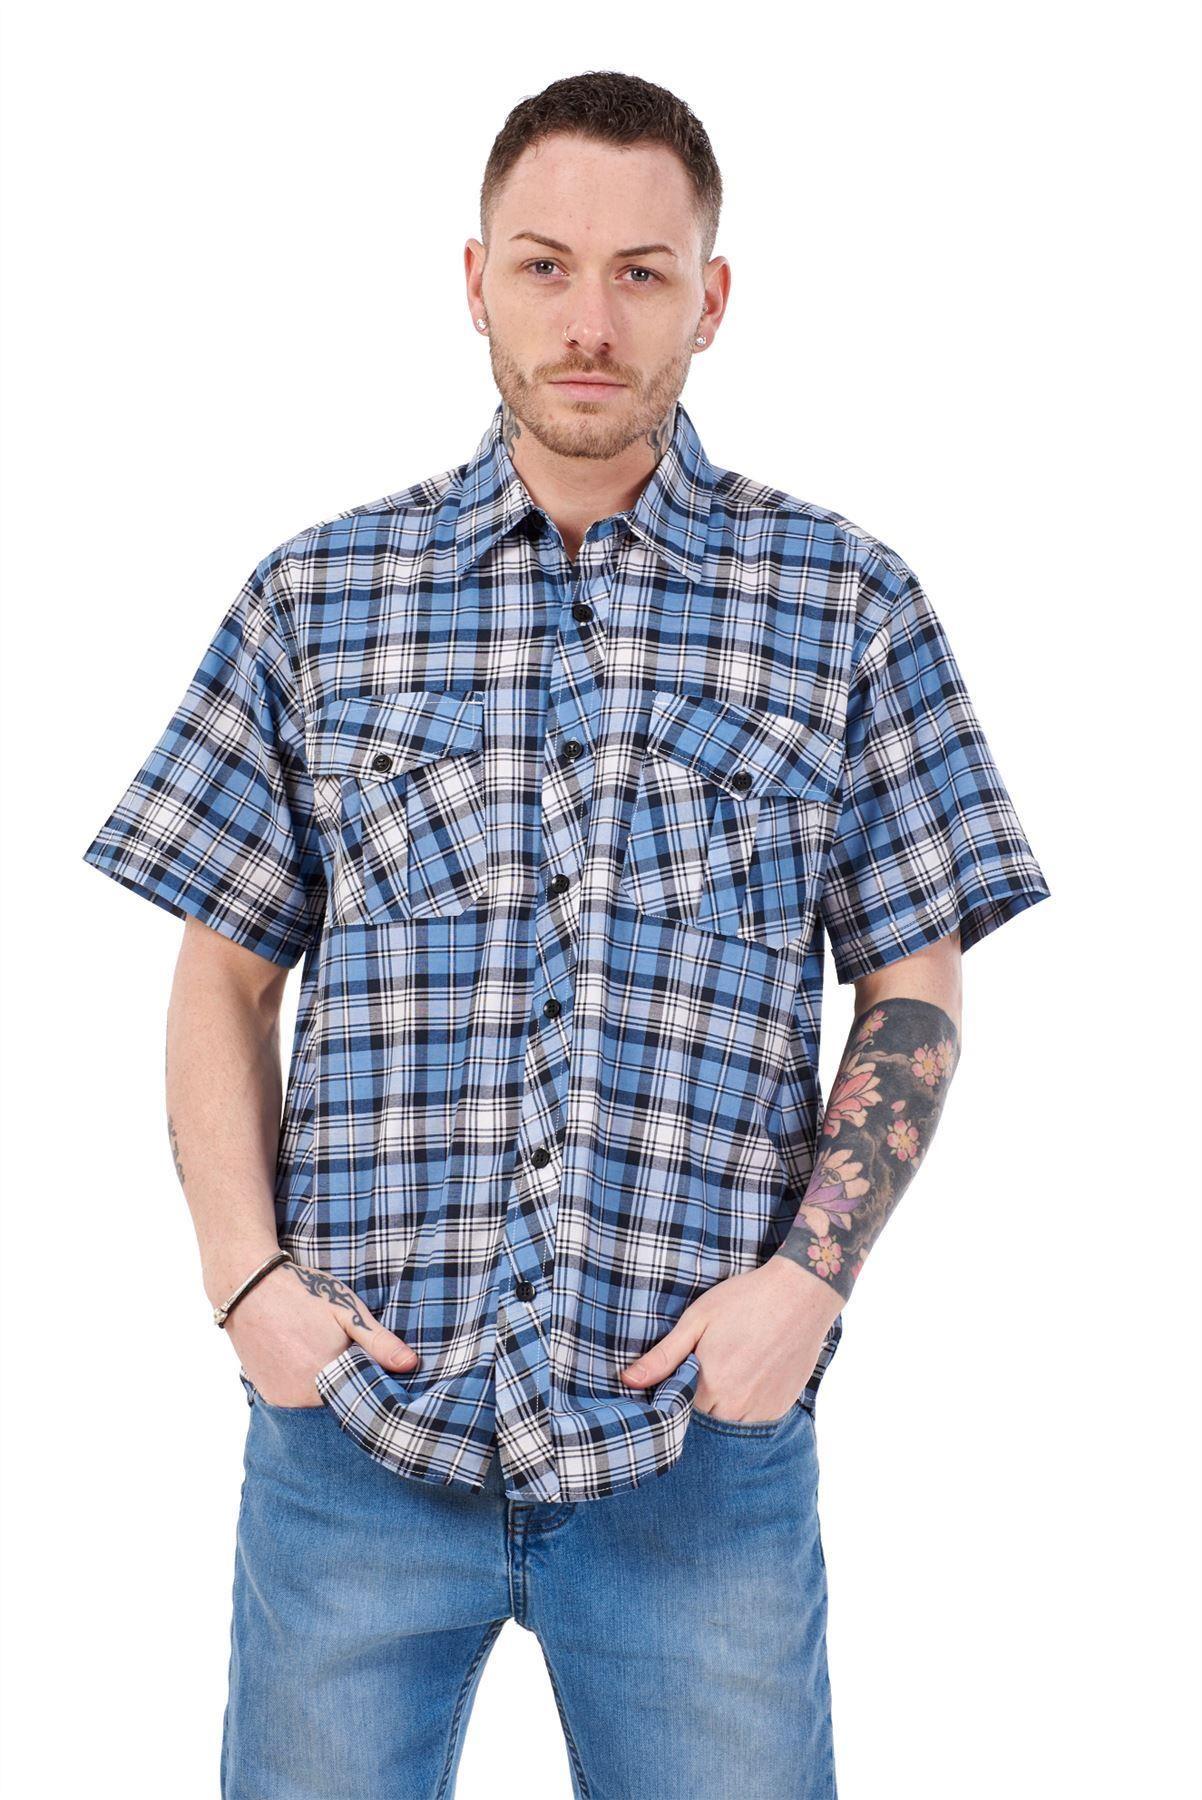 Mens-Regular-Big-Size-Shirts-Checked-Cotton-Blend-Casual-Short-Sleeve-Blue-M-5XL thumbnail 32